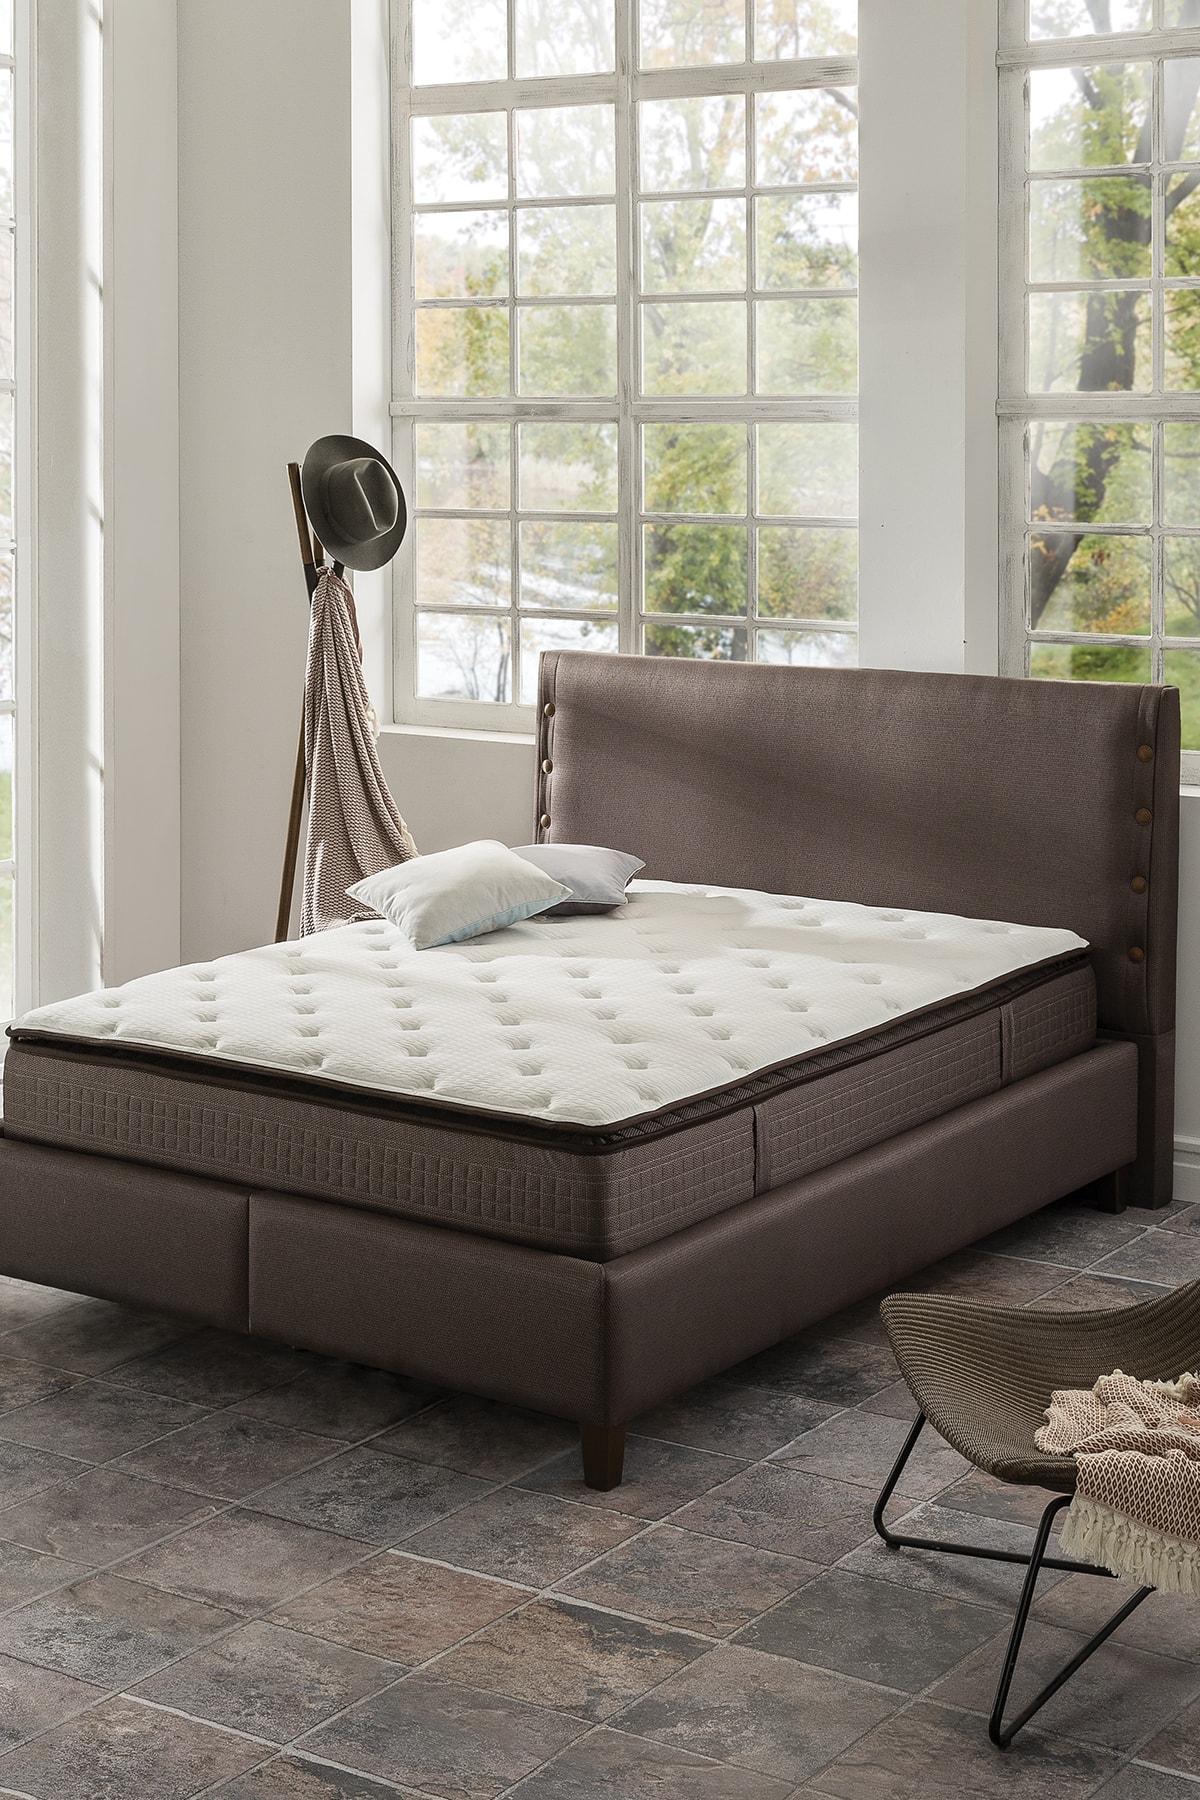 Yataş Selena Sueno Pedli Yaylı Yatak